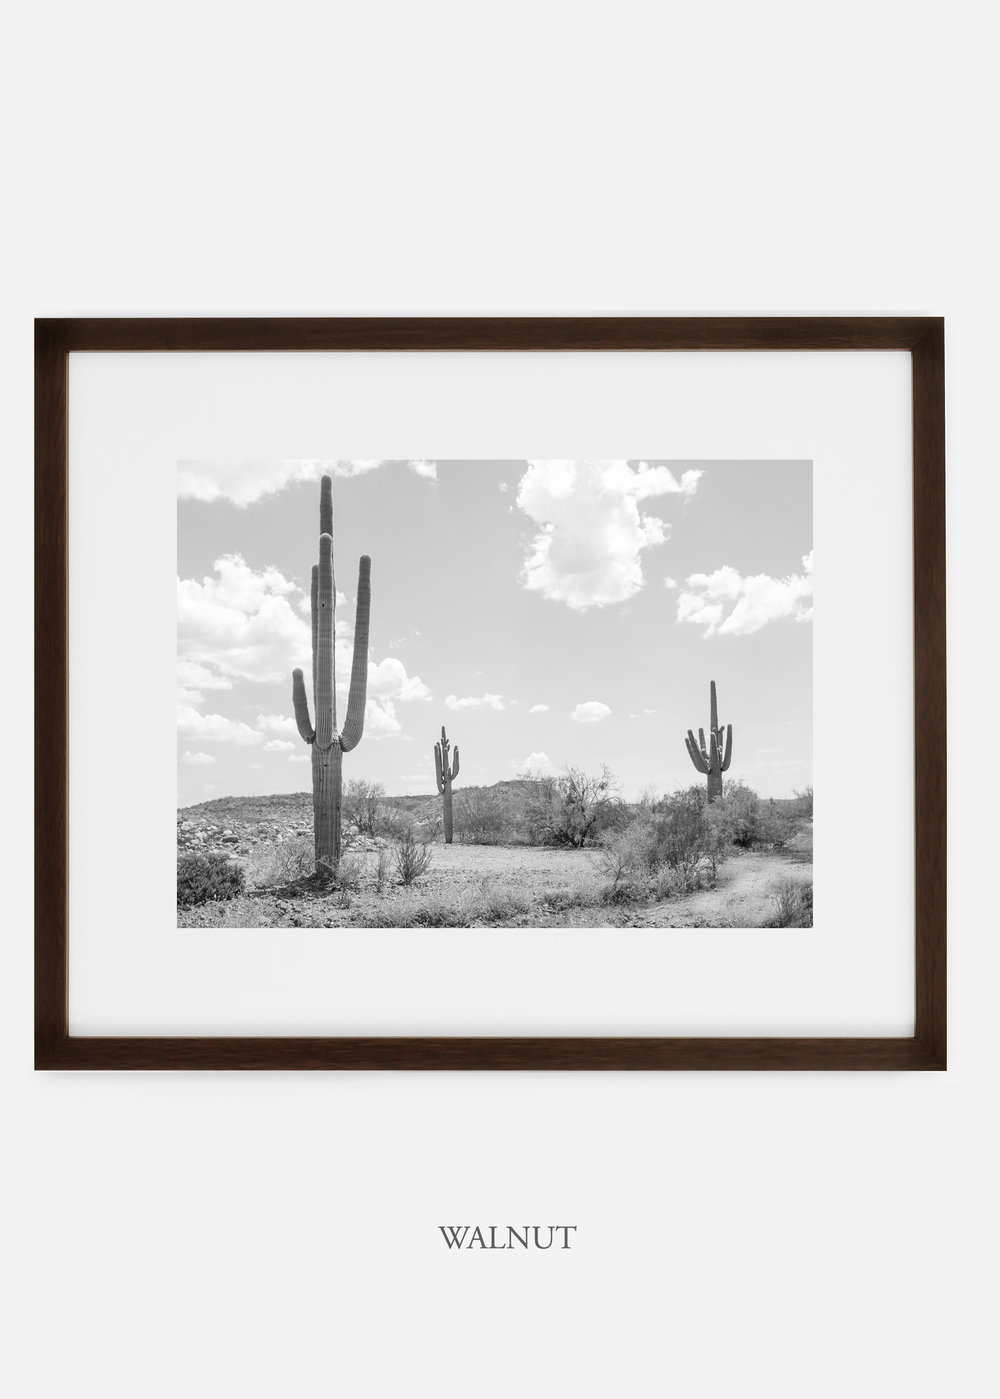 wildercalifornia_walnutframe_threesaguaro_cactus_art_interiordesign.jpg